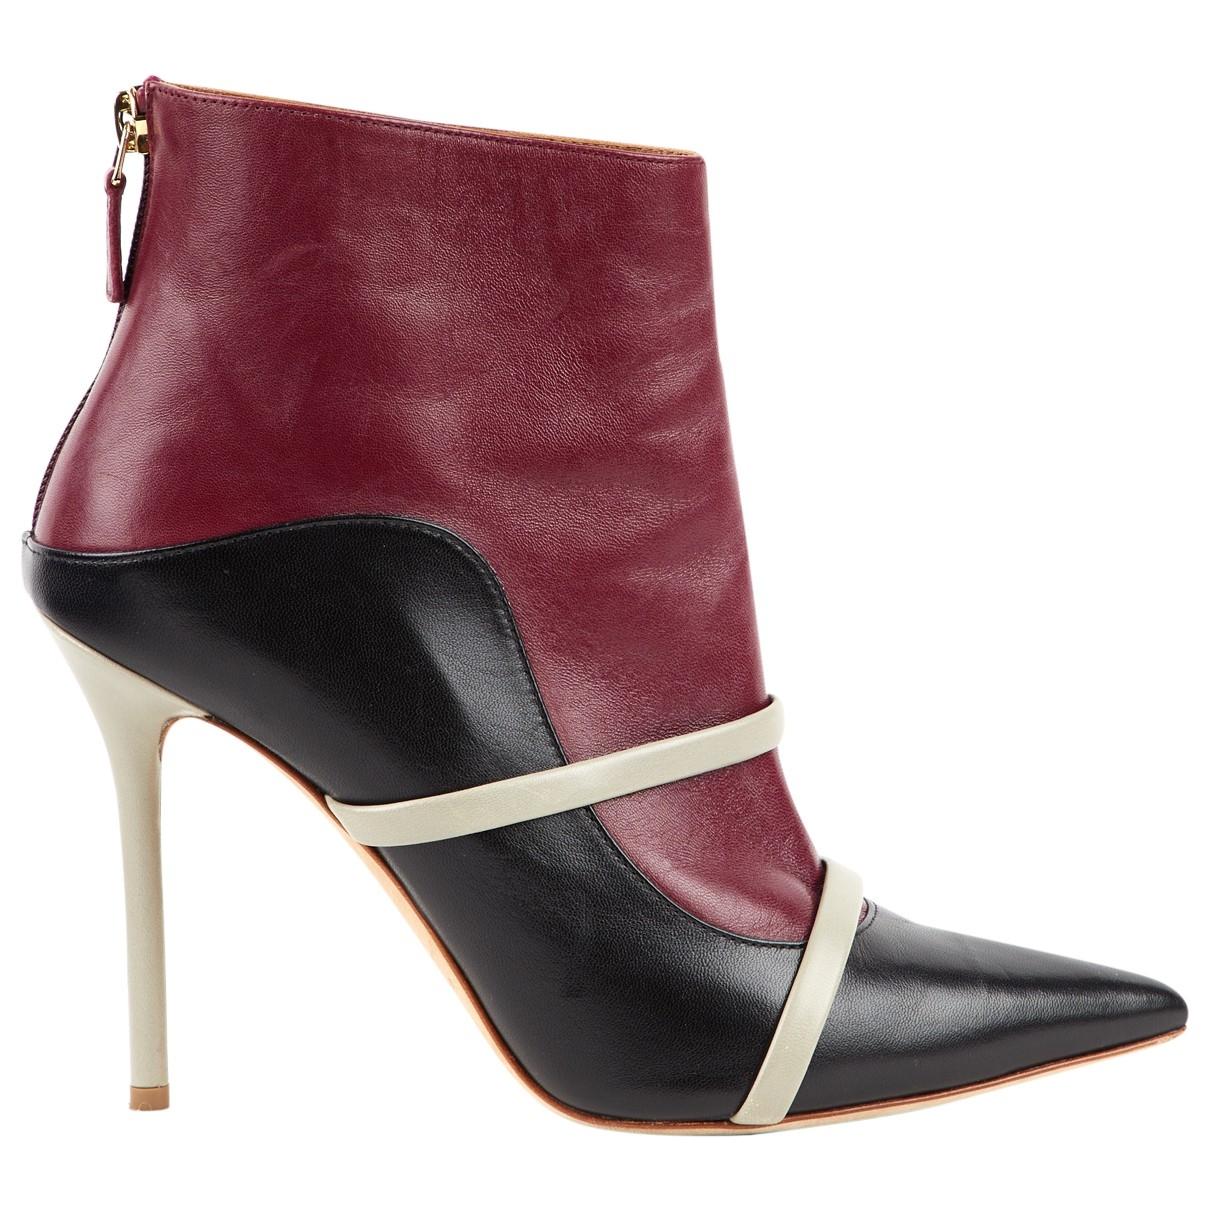 Malone Souliers \N Multicolour Leather Heels for Women 39 EU